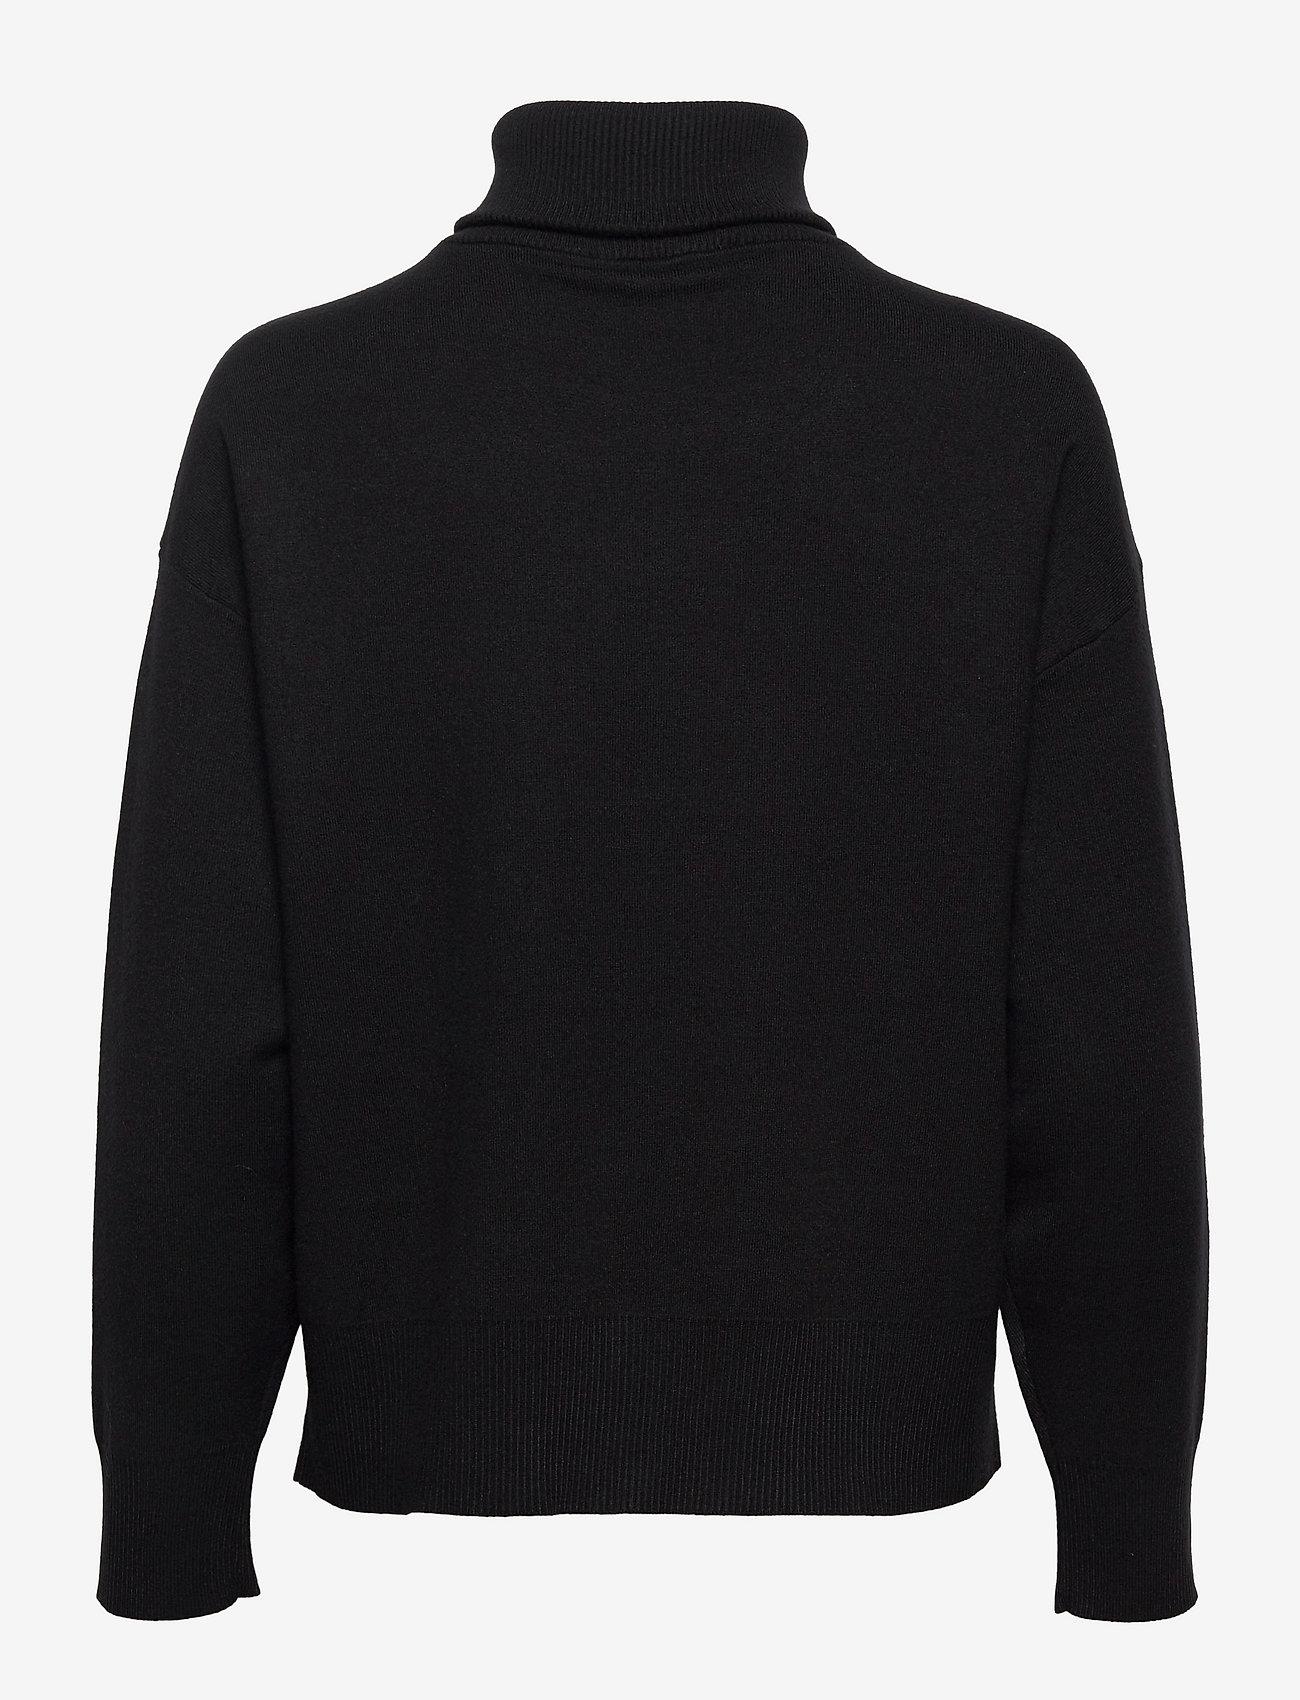 Gestuz - TalliGZ zipper pullover - trøjer - black - 1